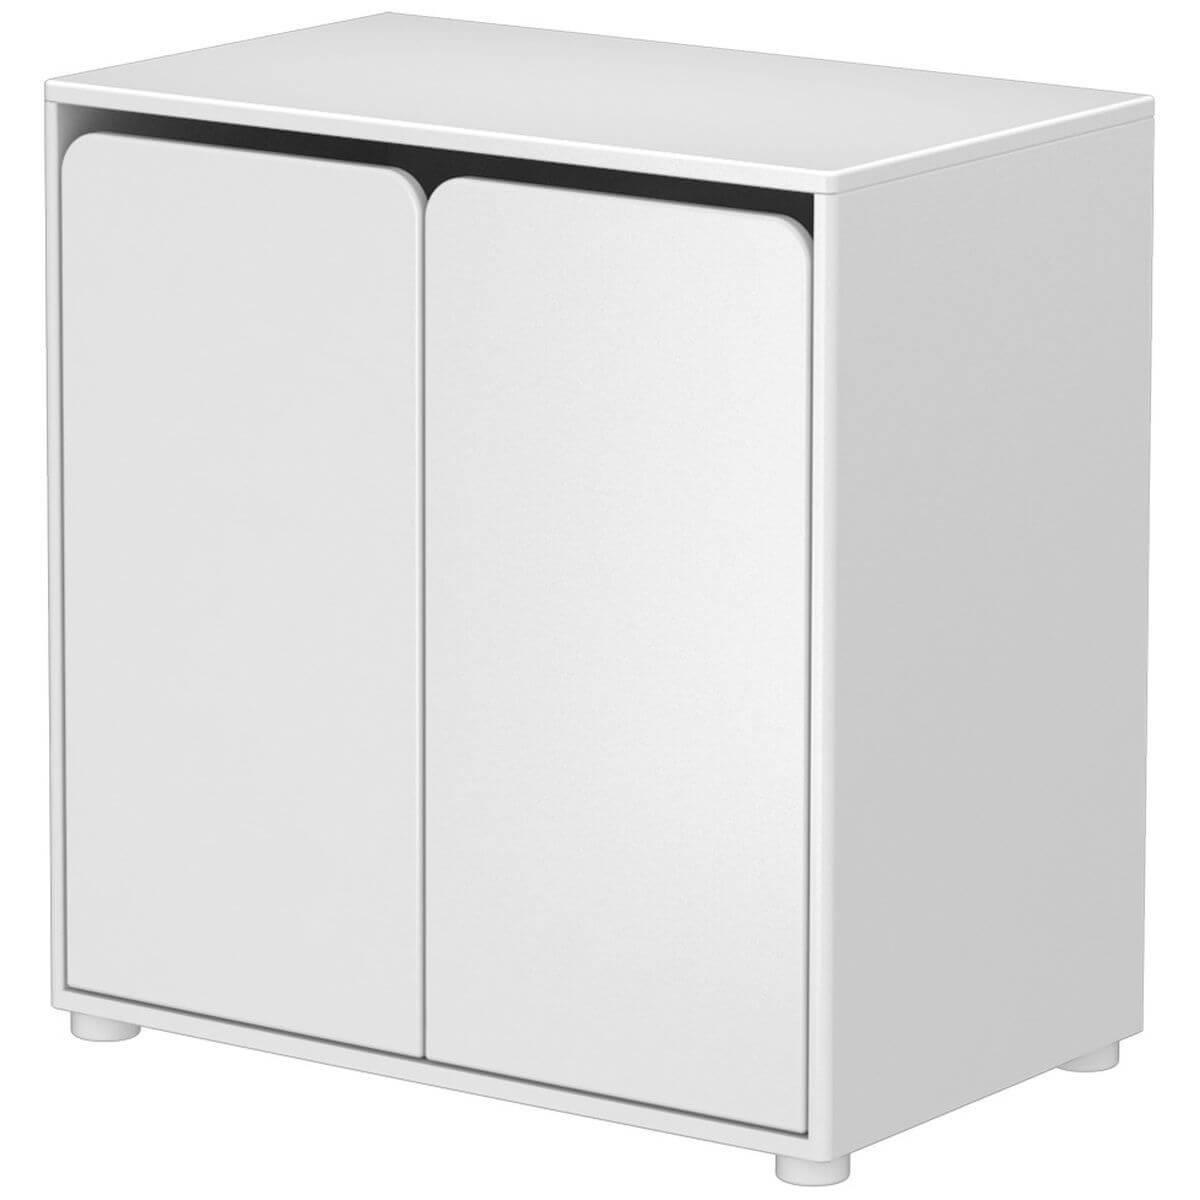 Mueble pequeño 2 puertas CABBY Flexa blanco